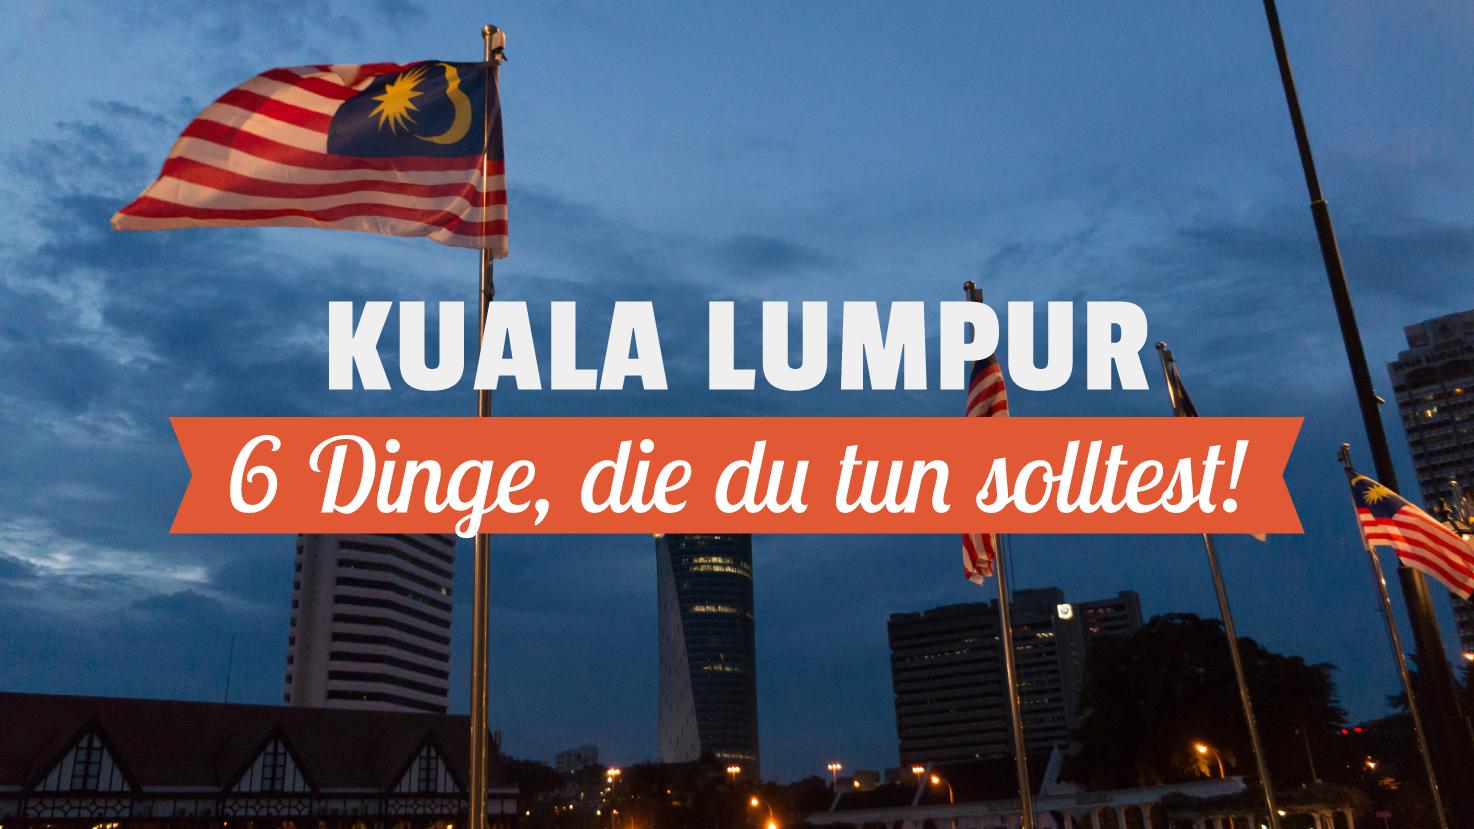 6 Dinge, die du in Kuala Lumpur tun solltest